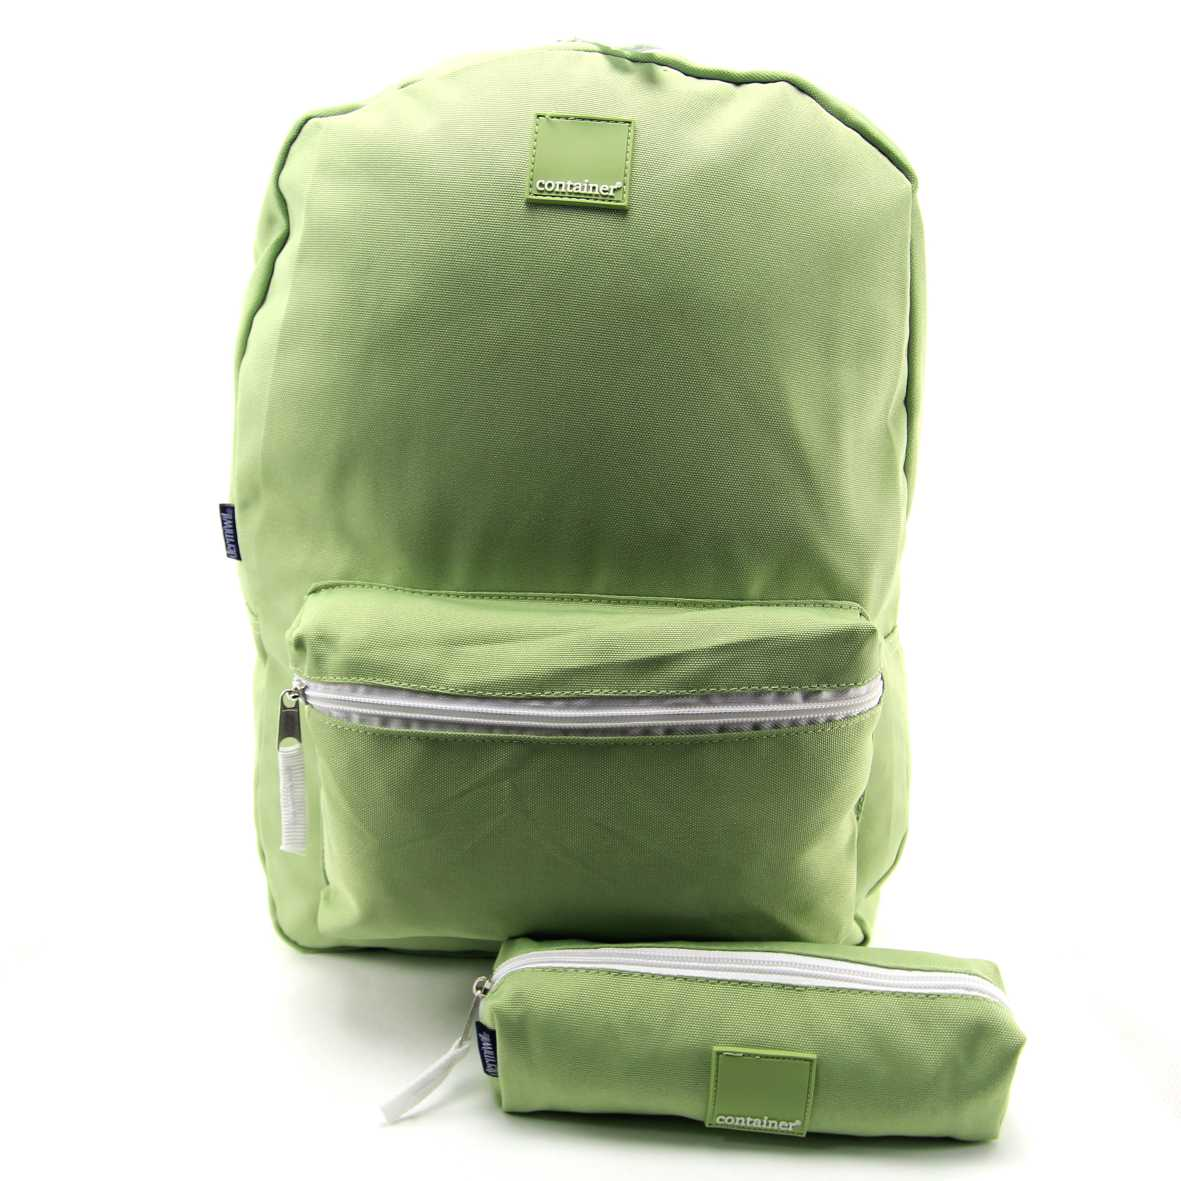 Mochila Container Verde Pastel com Estojo Dermiwil 37664